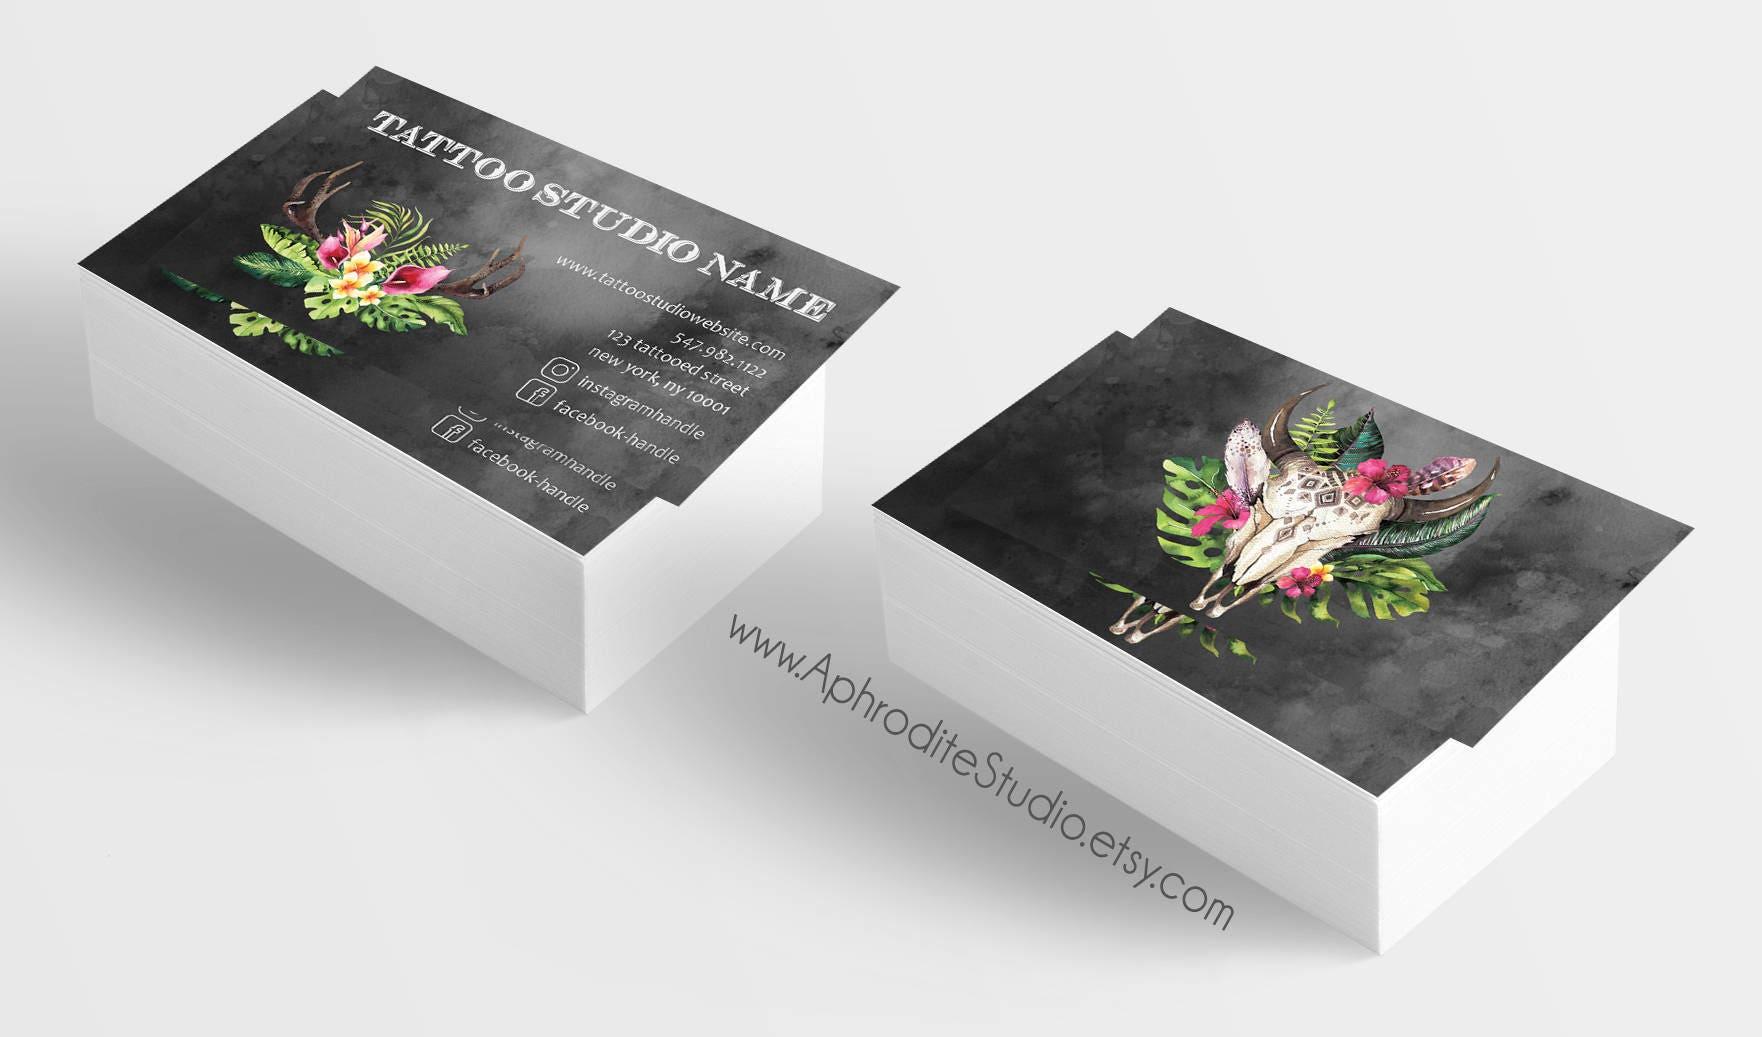 Skull business cards choice image free business cards tattoo business cards skull business cards printable business tattoo business cards skull business cards printable business magicingreecefo Choice Image